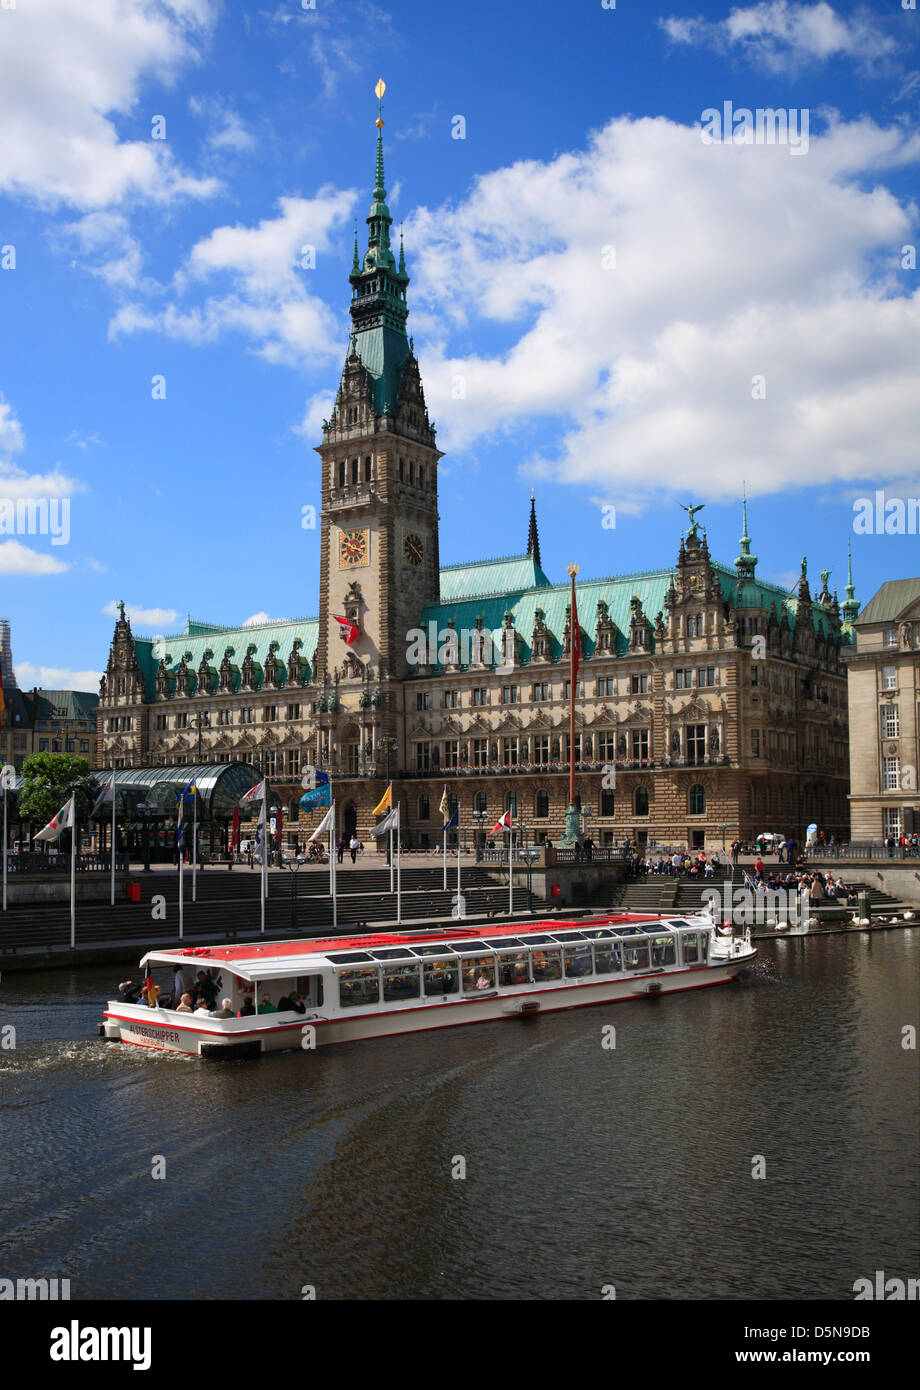 View from Alsterarkaden to city hall, Hamburg, Germany - Stock Image